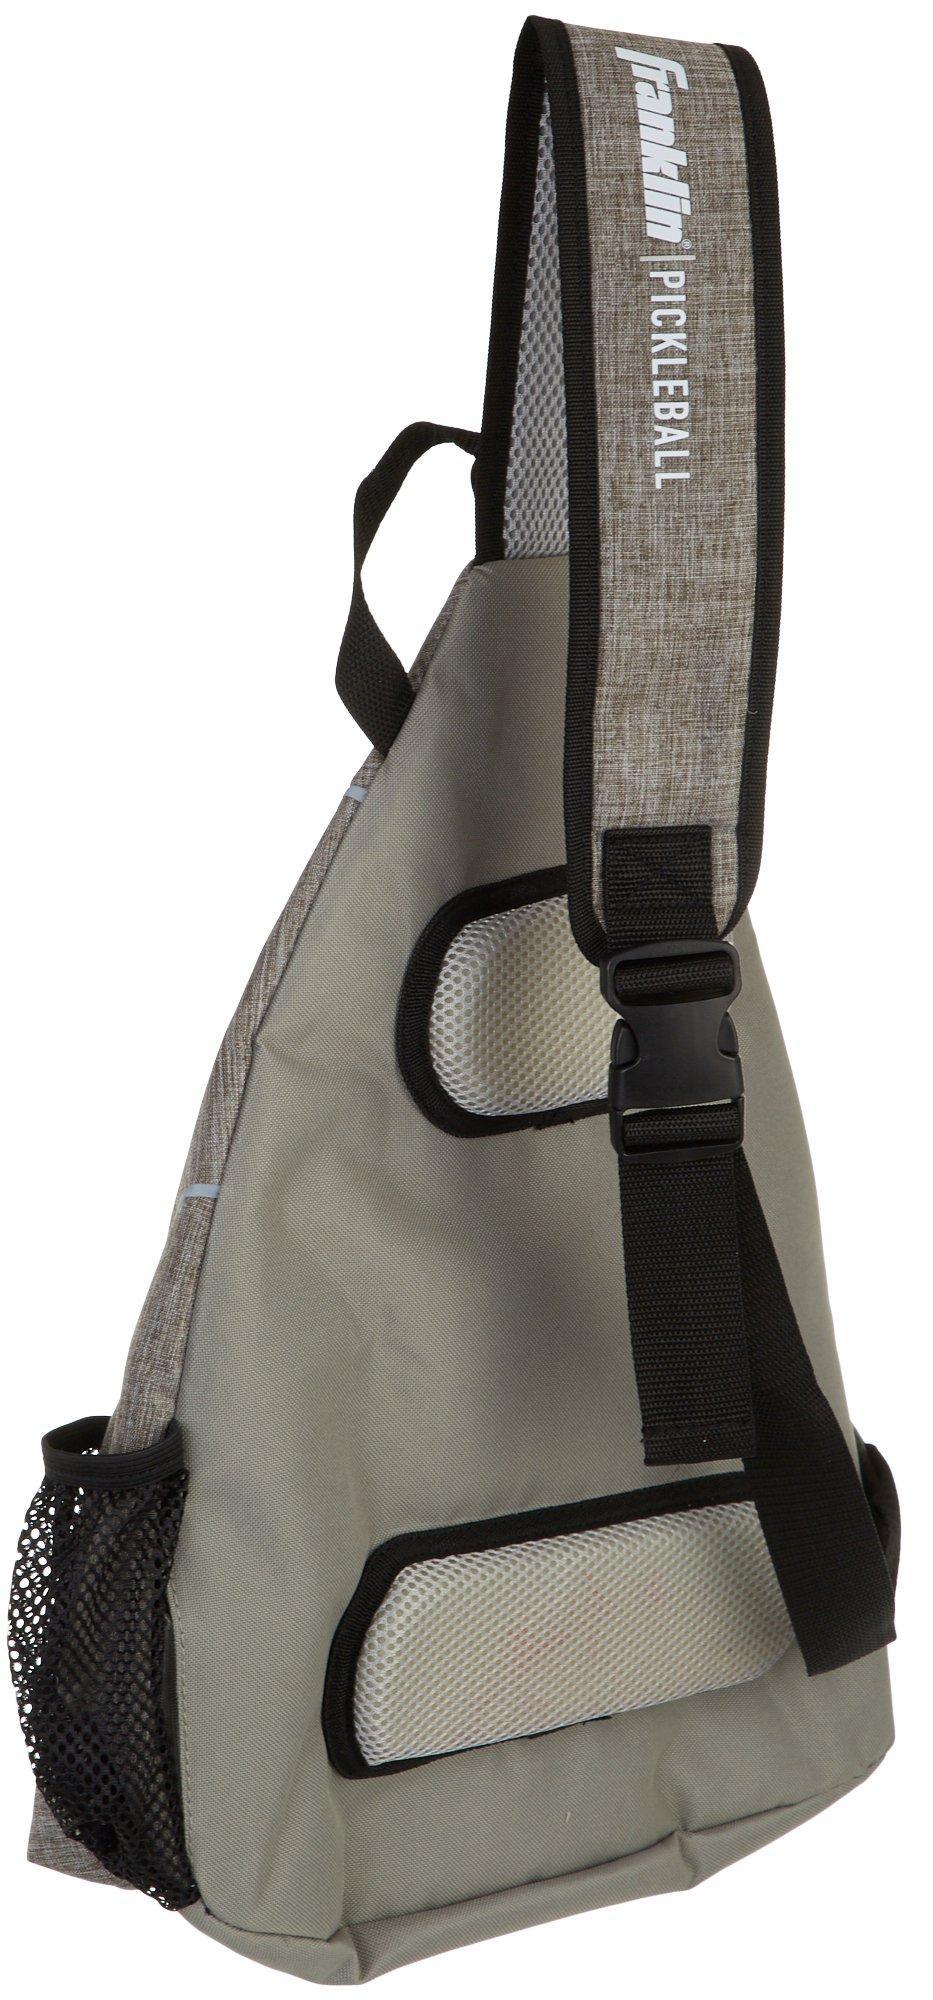 *NEW* Franklin Sports Pickleball X Elite Multi-Purpose Sling Bag Backpack Grey